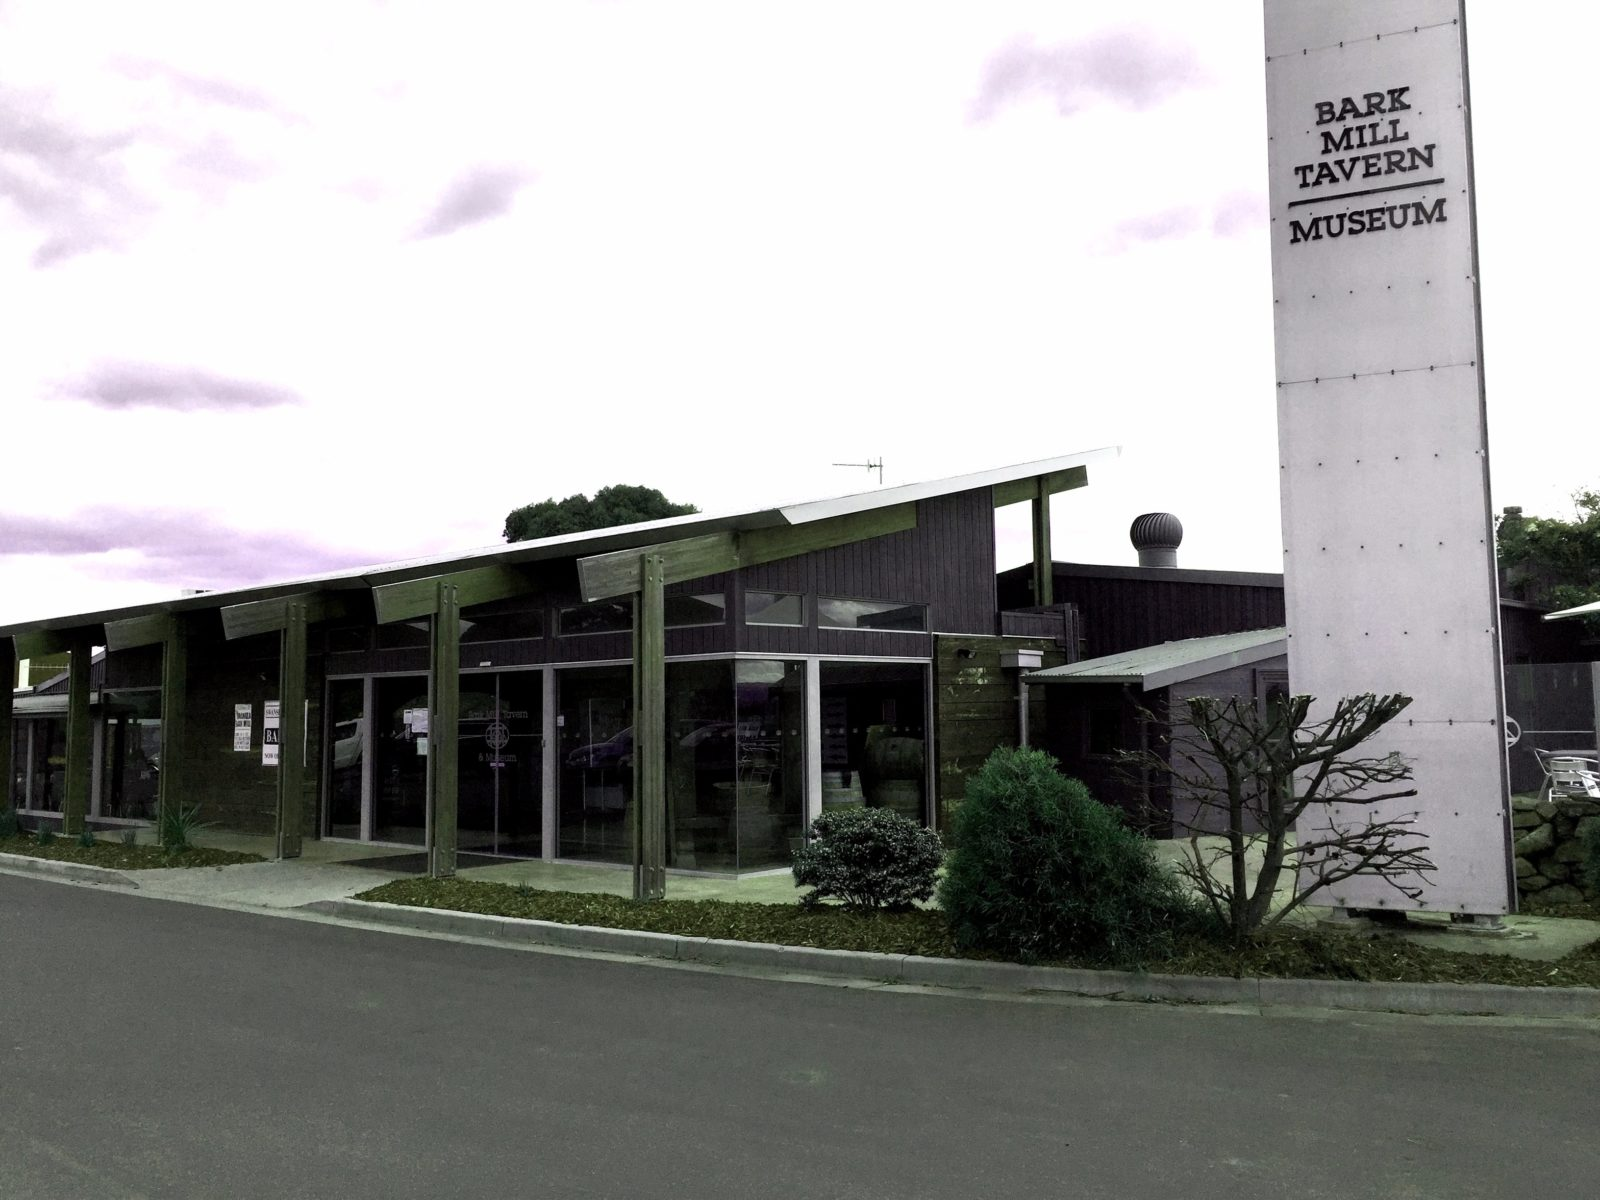 Bark Mill Tavern